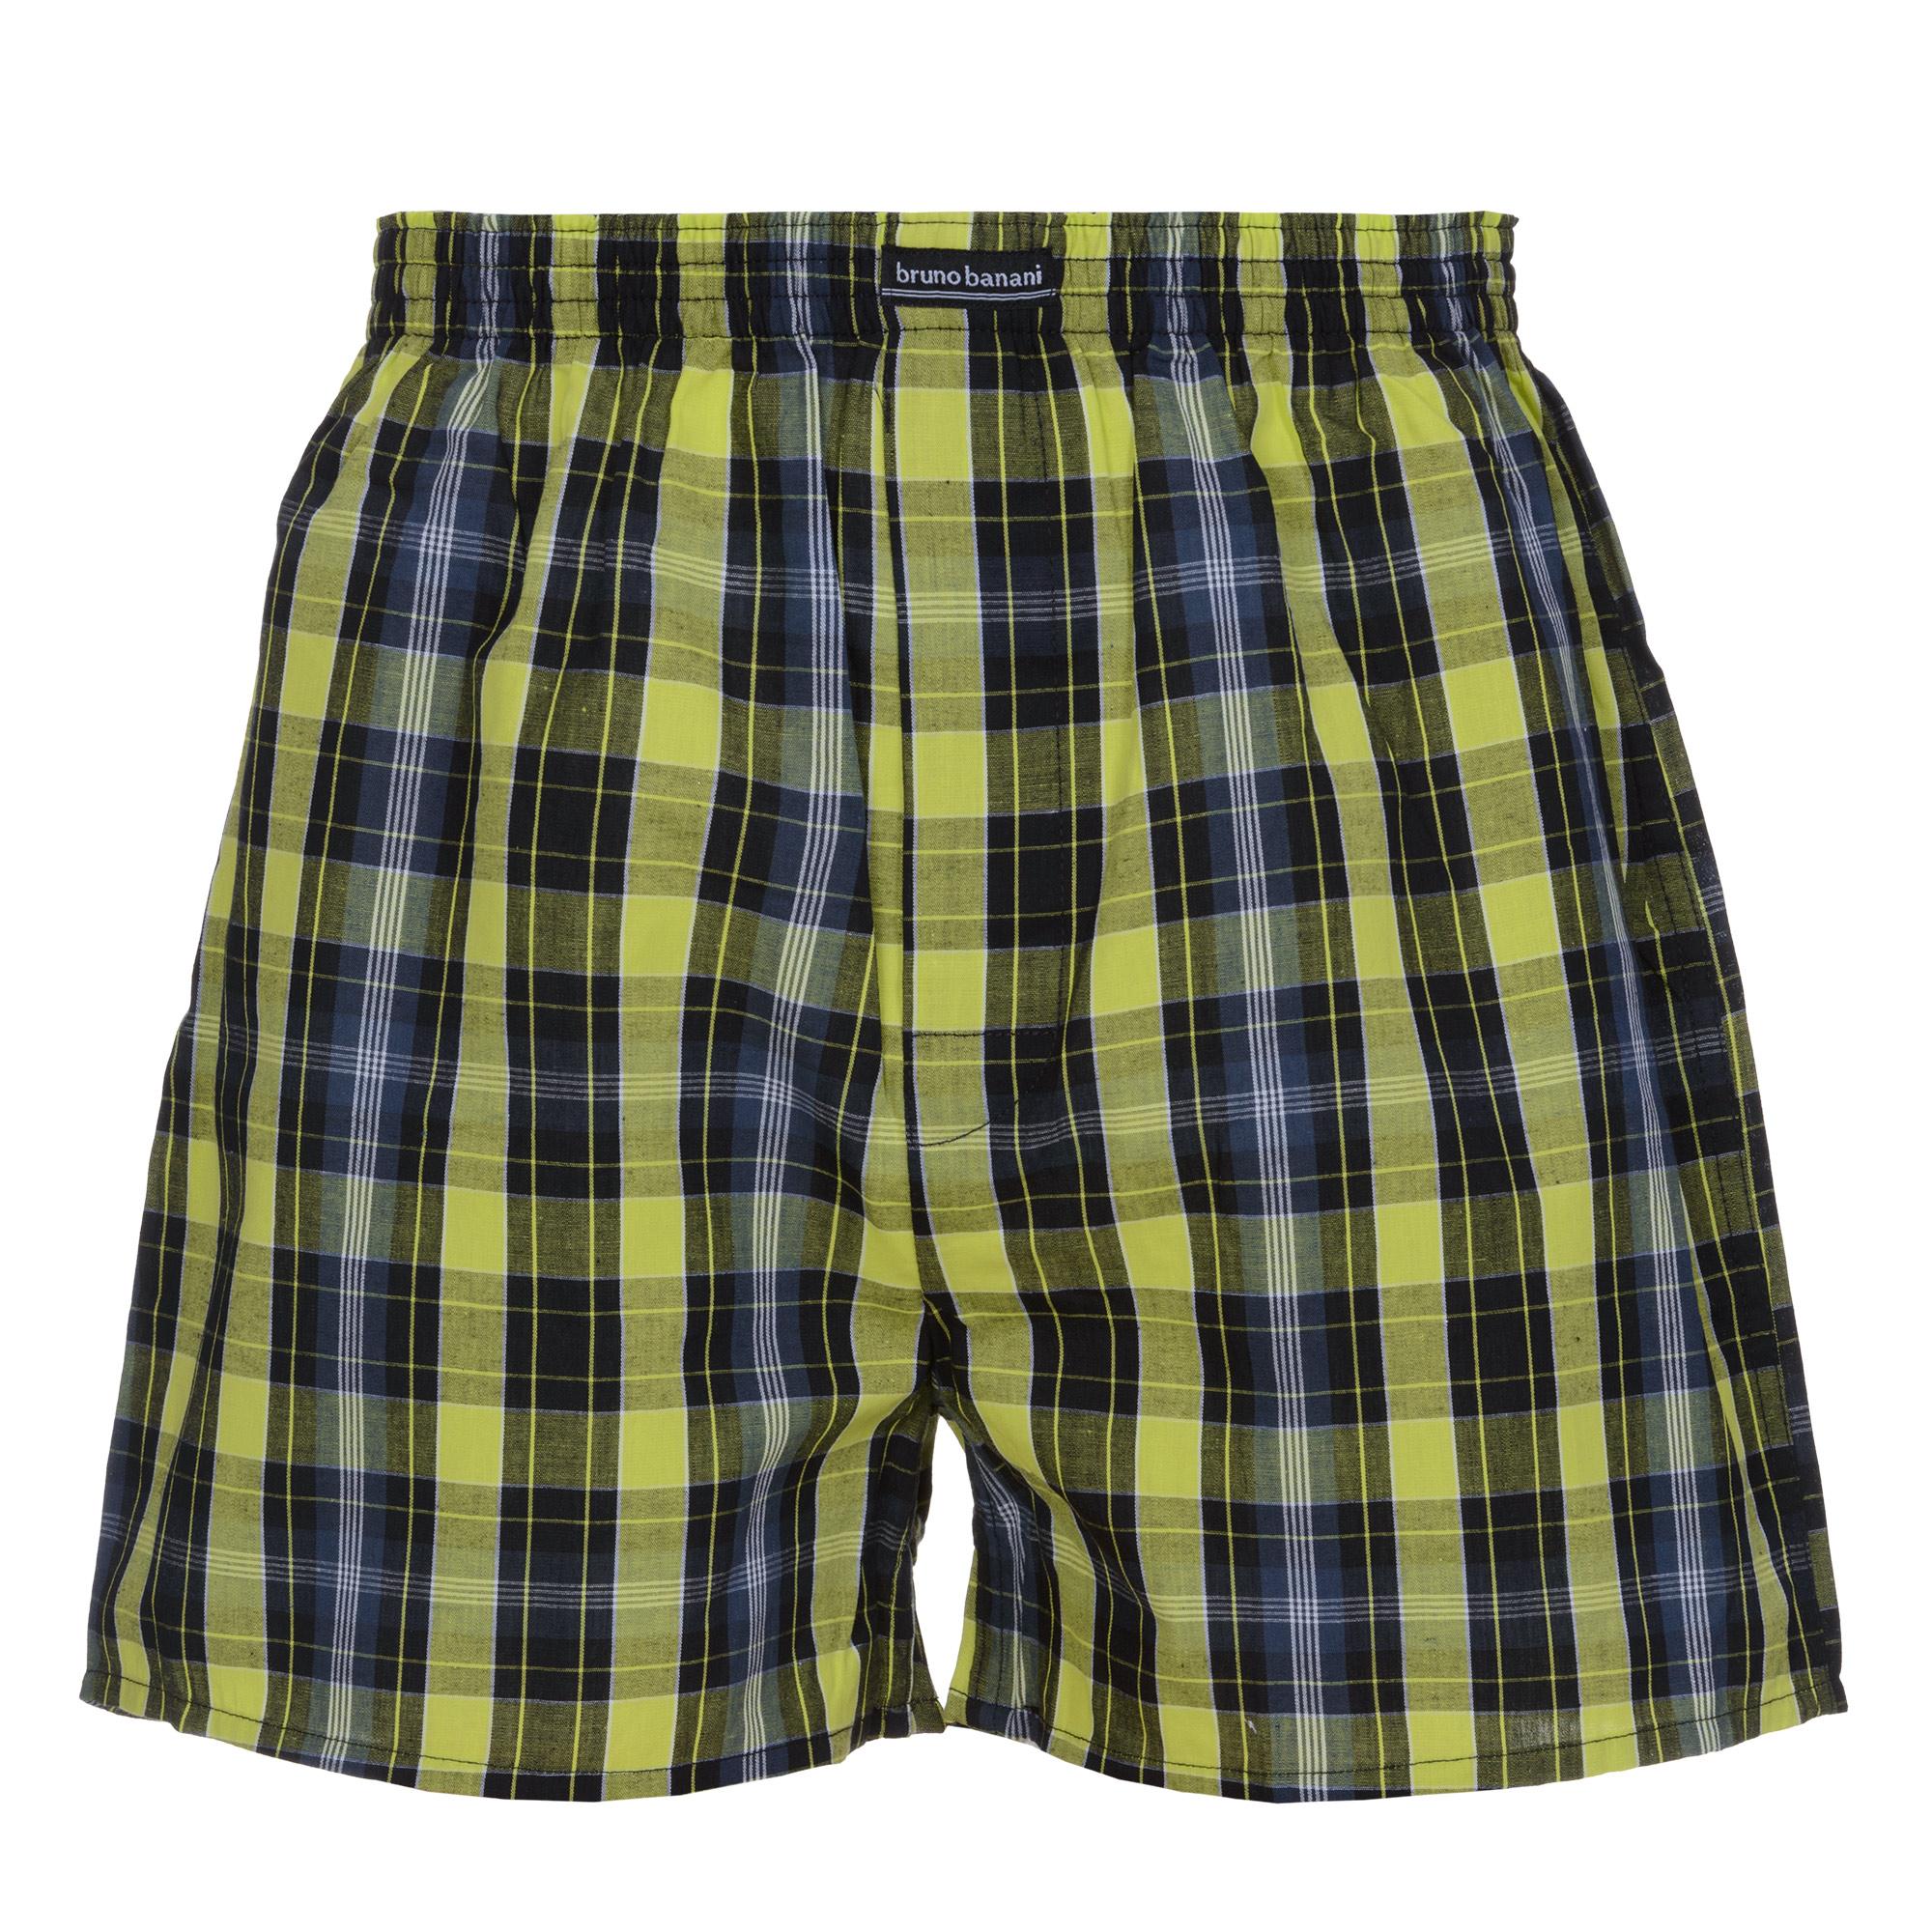 XL//7 bruno banani herren hip short pant hipster trunk TRAFFIC CHAOS print Gr